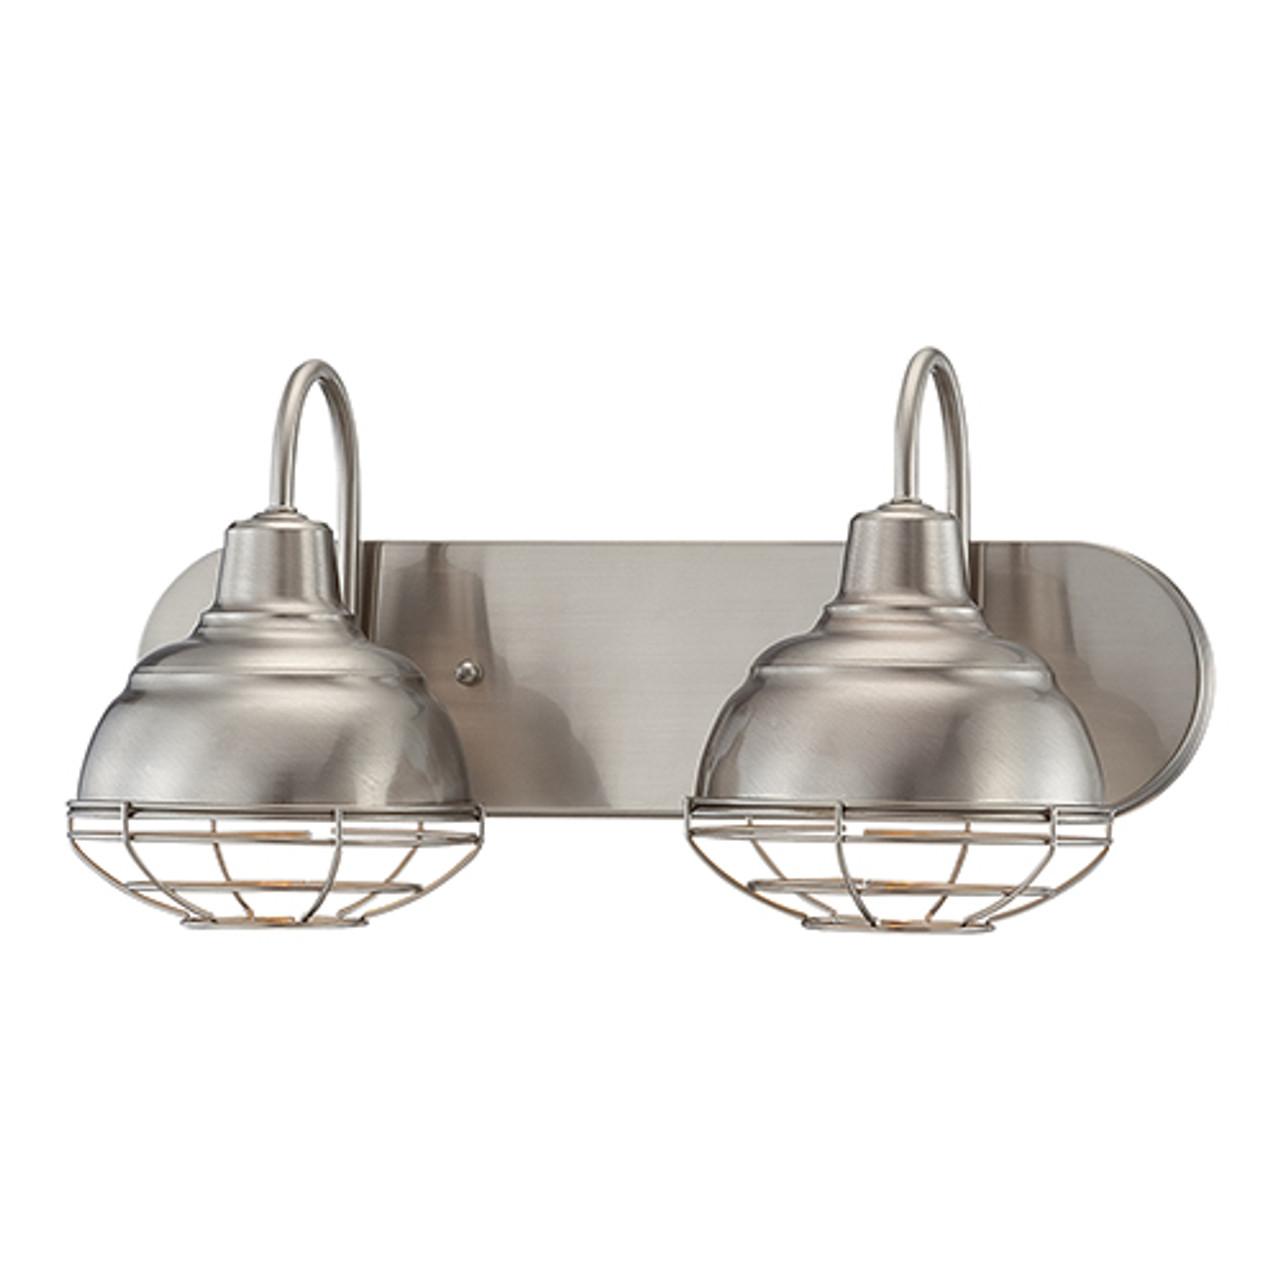 Millennium Lighting 5422 Sn Neo Industrial Vanity Light In Satin Nickel At Clw Lighting